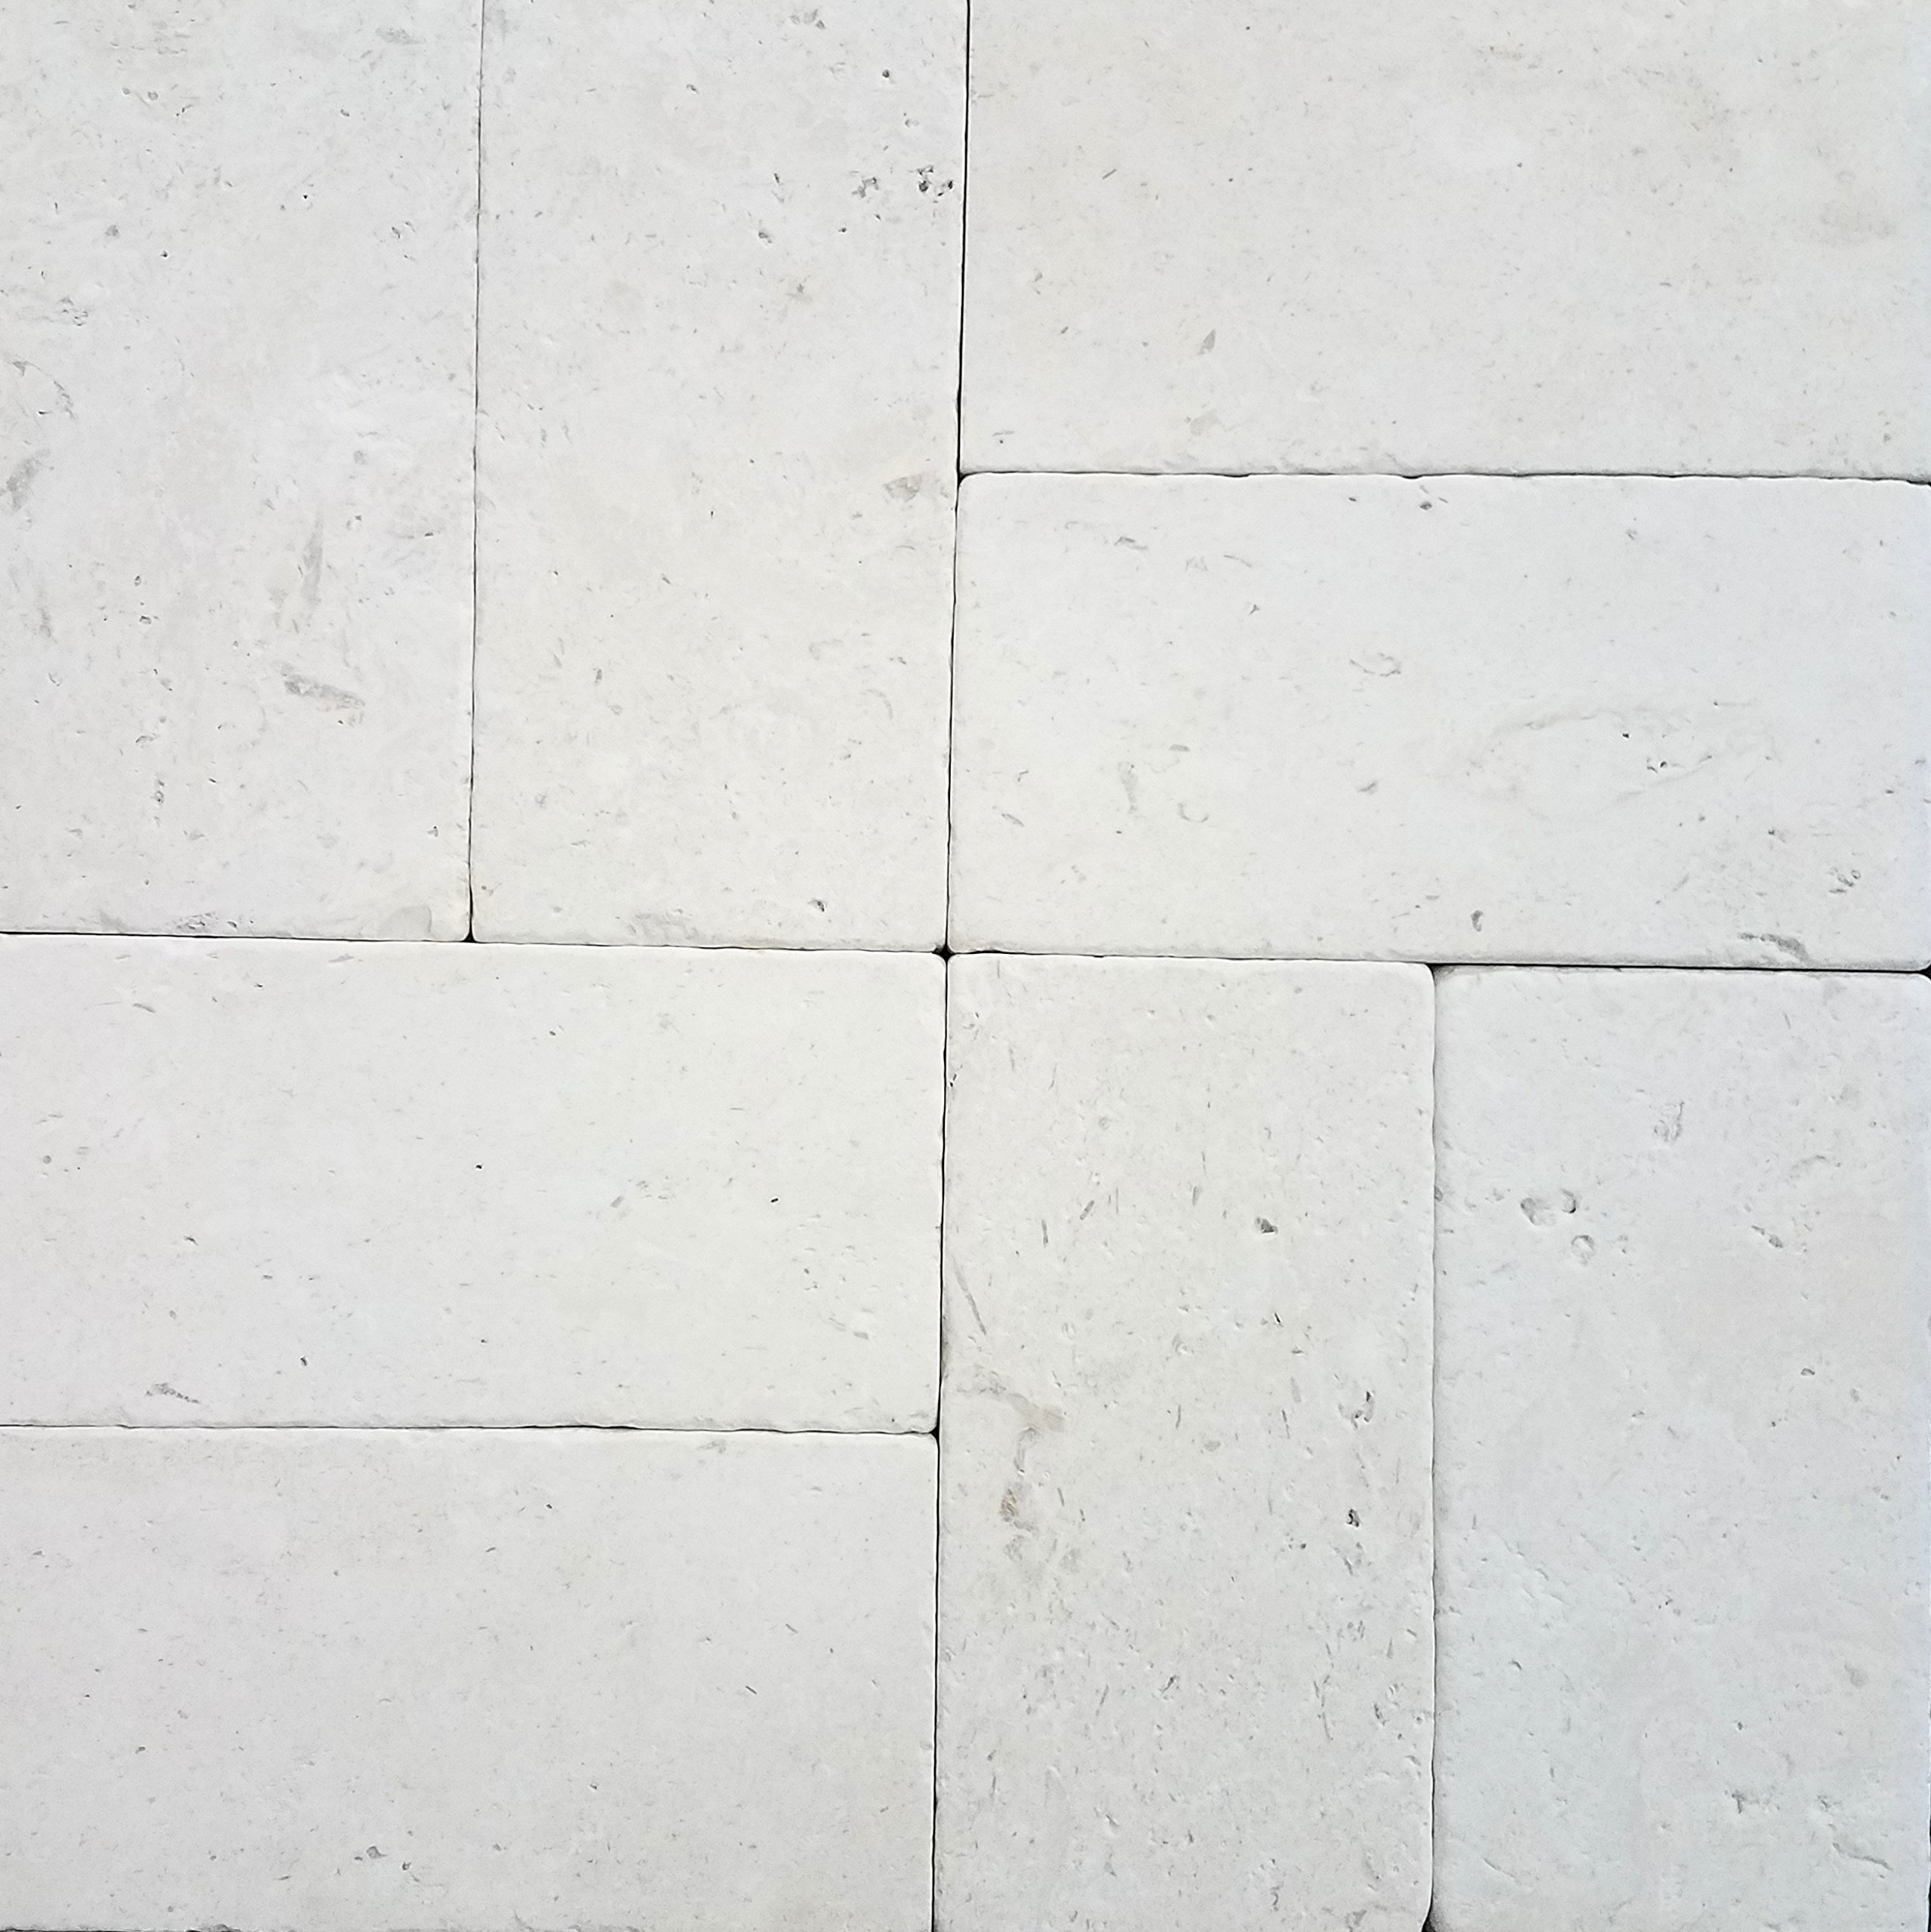 300 pcs Natural Limestone Pavers 6x12 (Aqua Shell) 150 SQ.FT. Pool & Patio, Driveway, Backyard, Outdoors & Indoors by Stone Zone